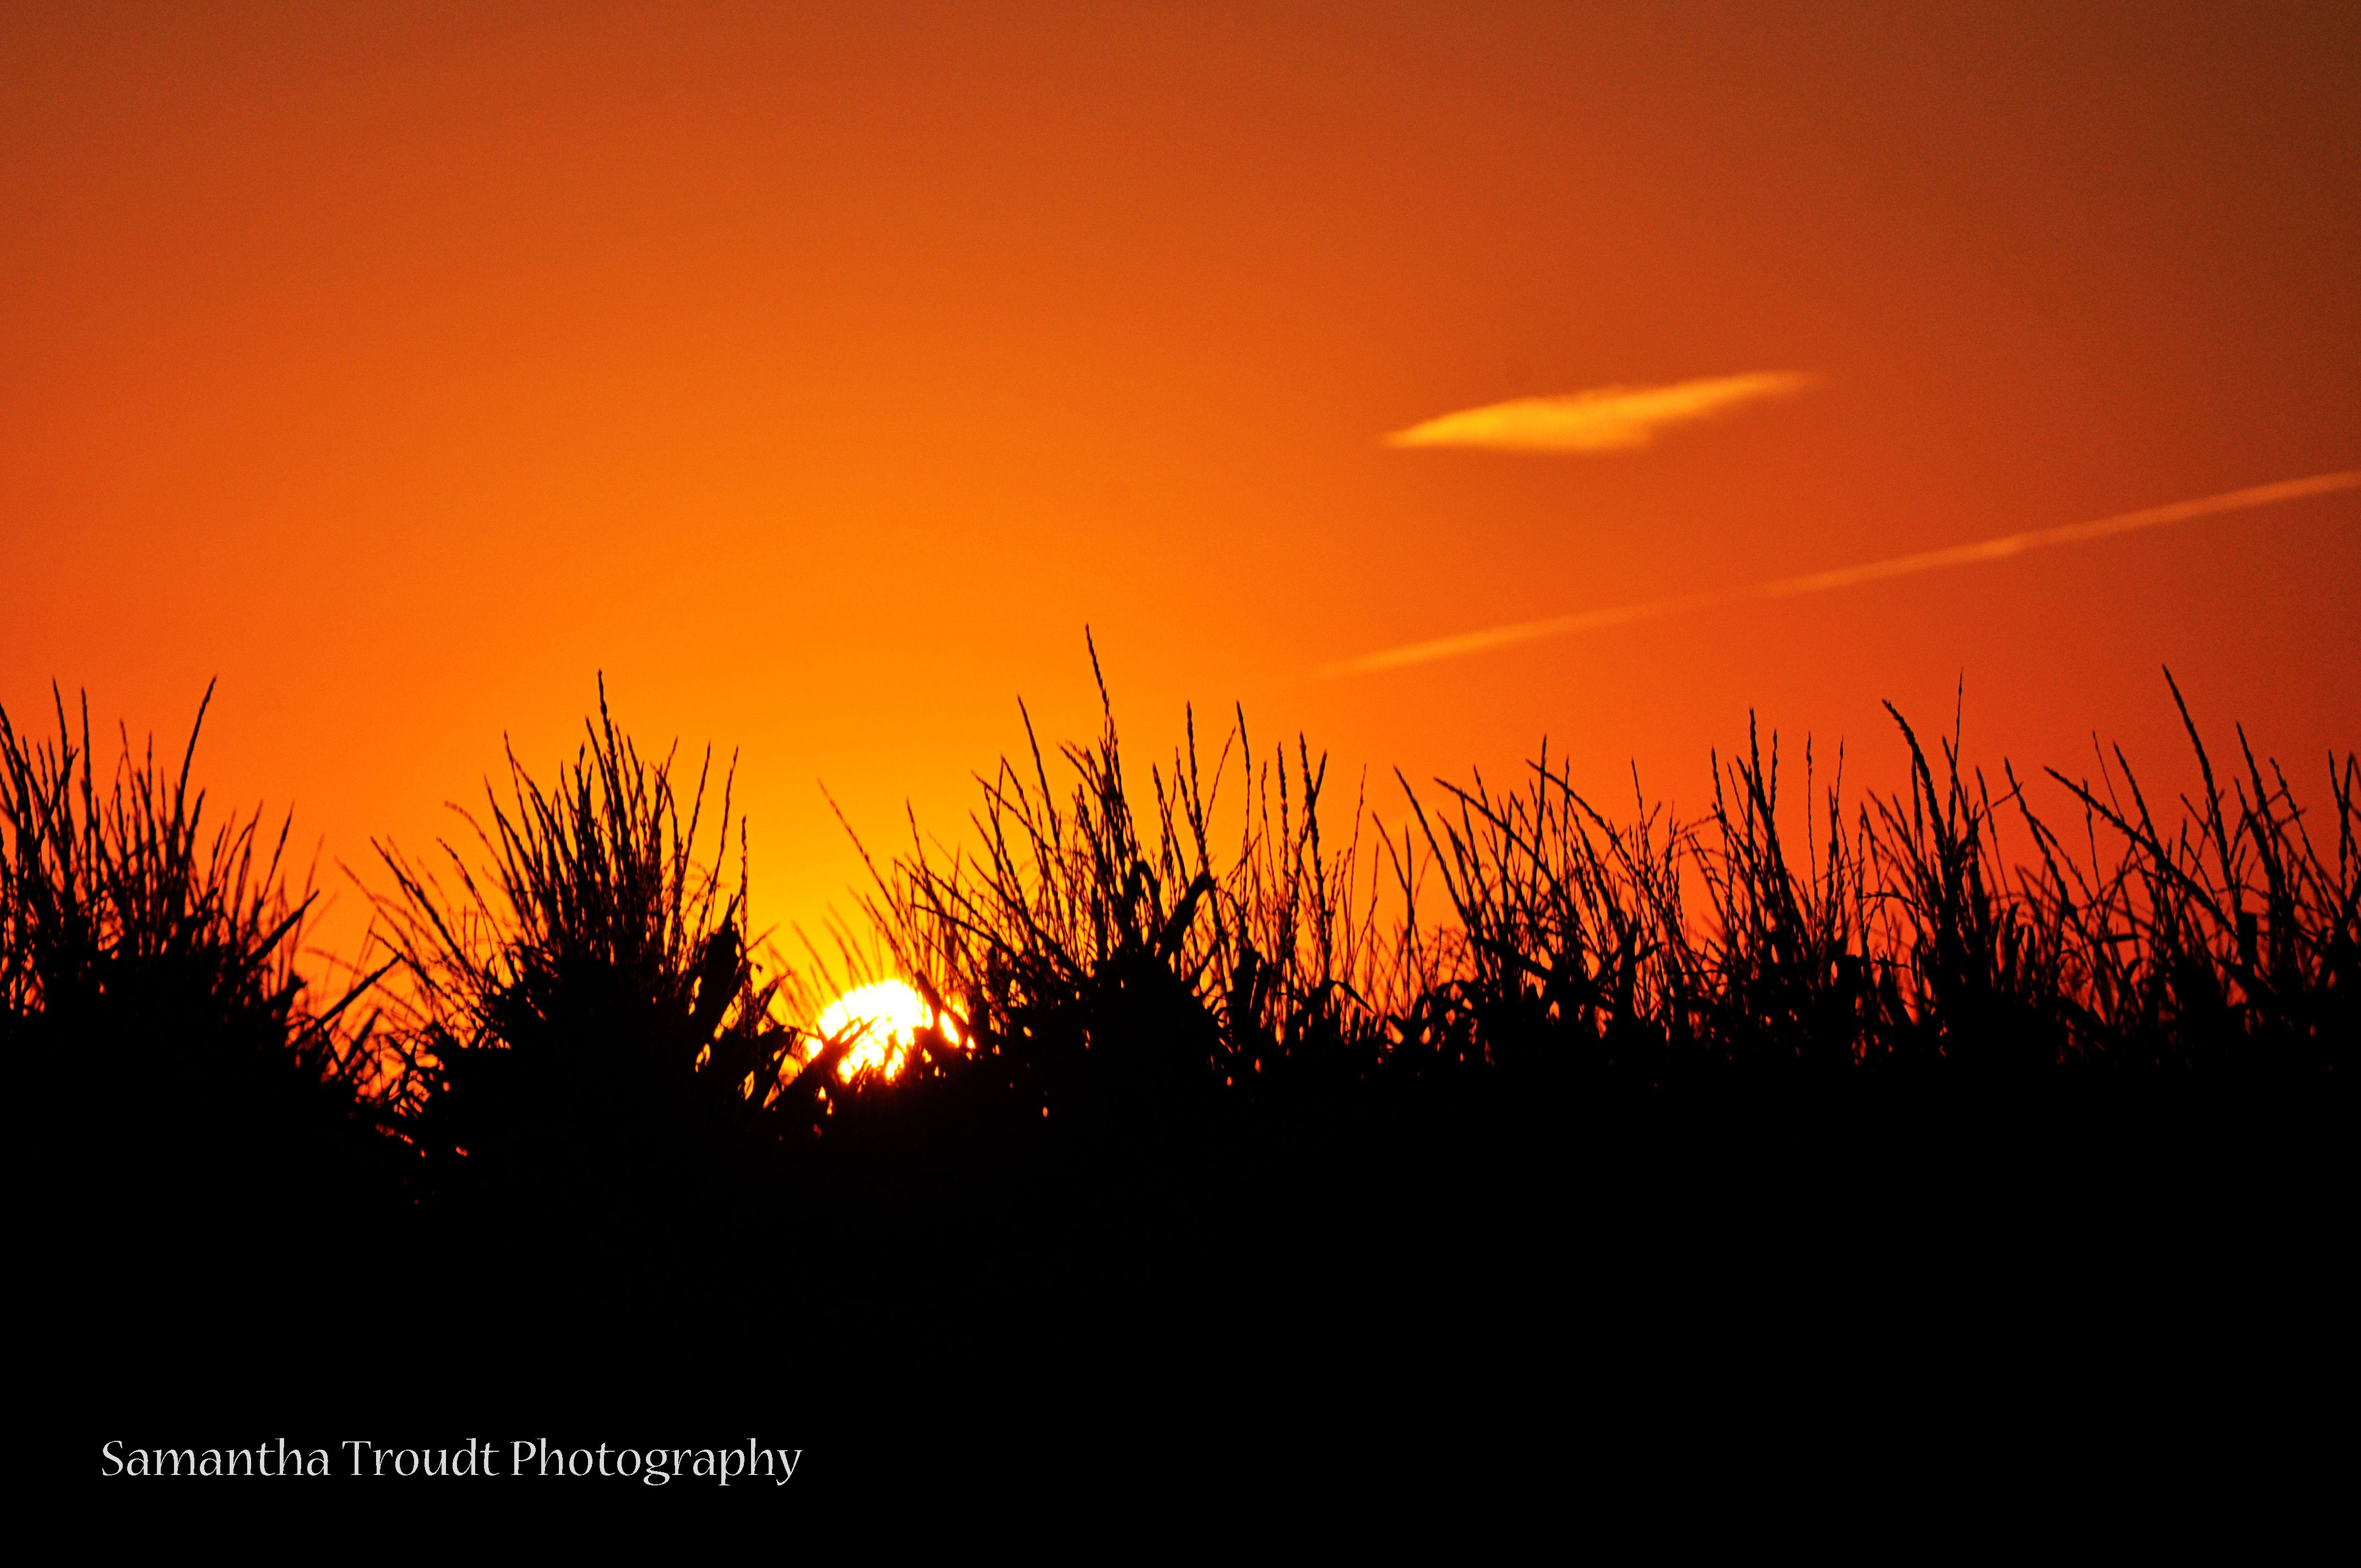 Sun rising behind a field of corn.